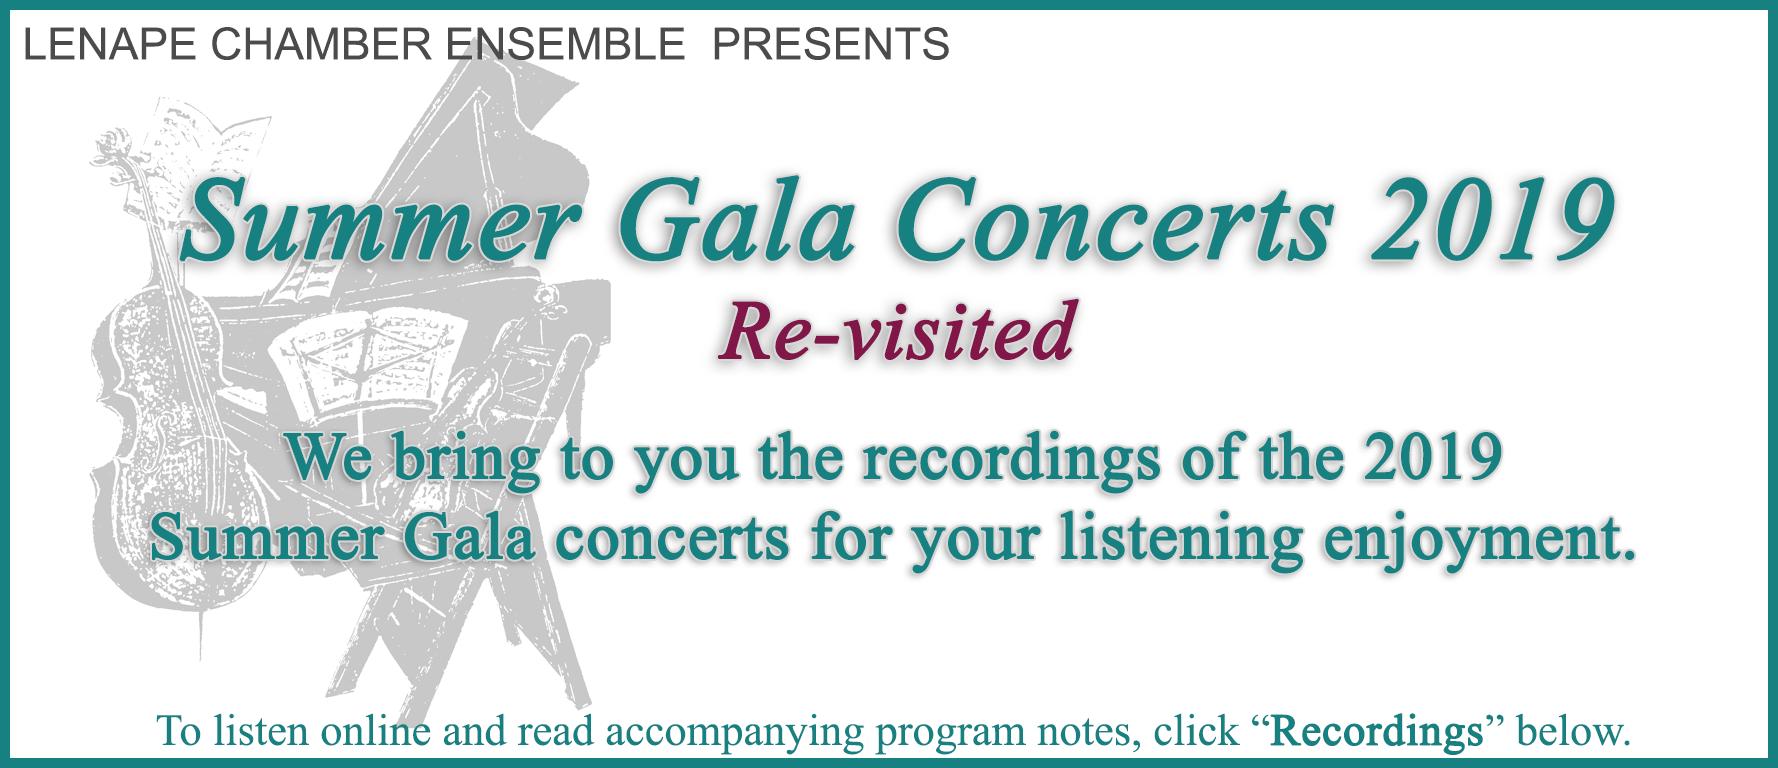 Lenape Chamber Ensemble